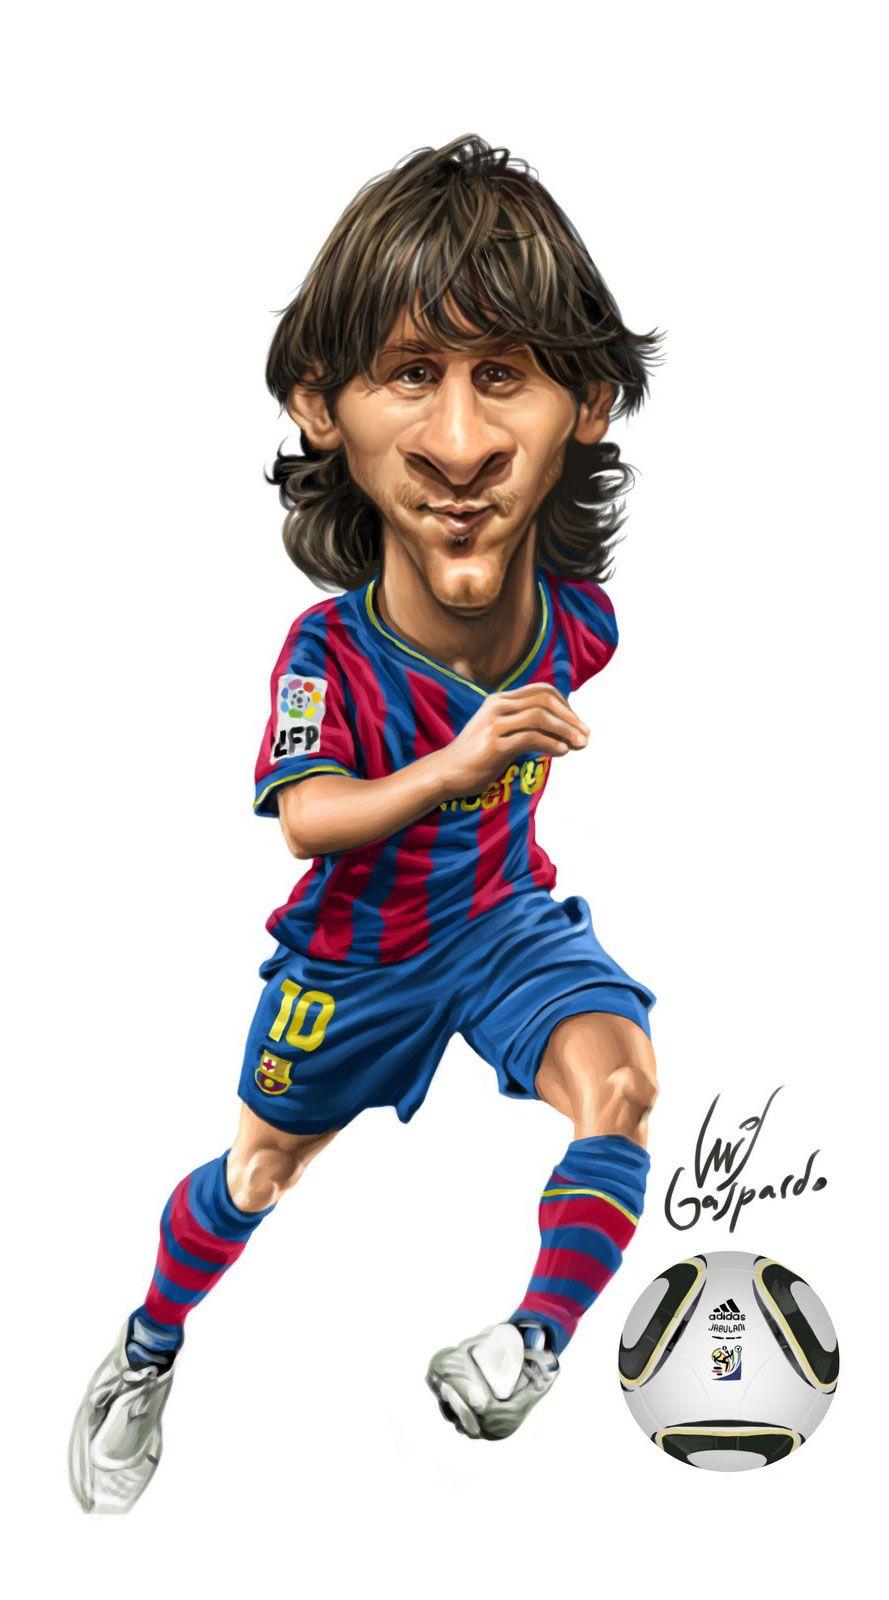 Caricaturas de Messi  Dibujos caricaturas y cmics  Pinterest